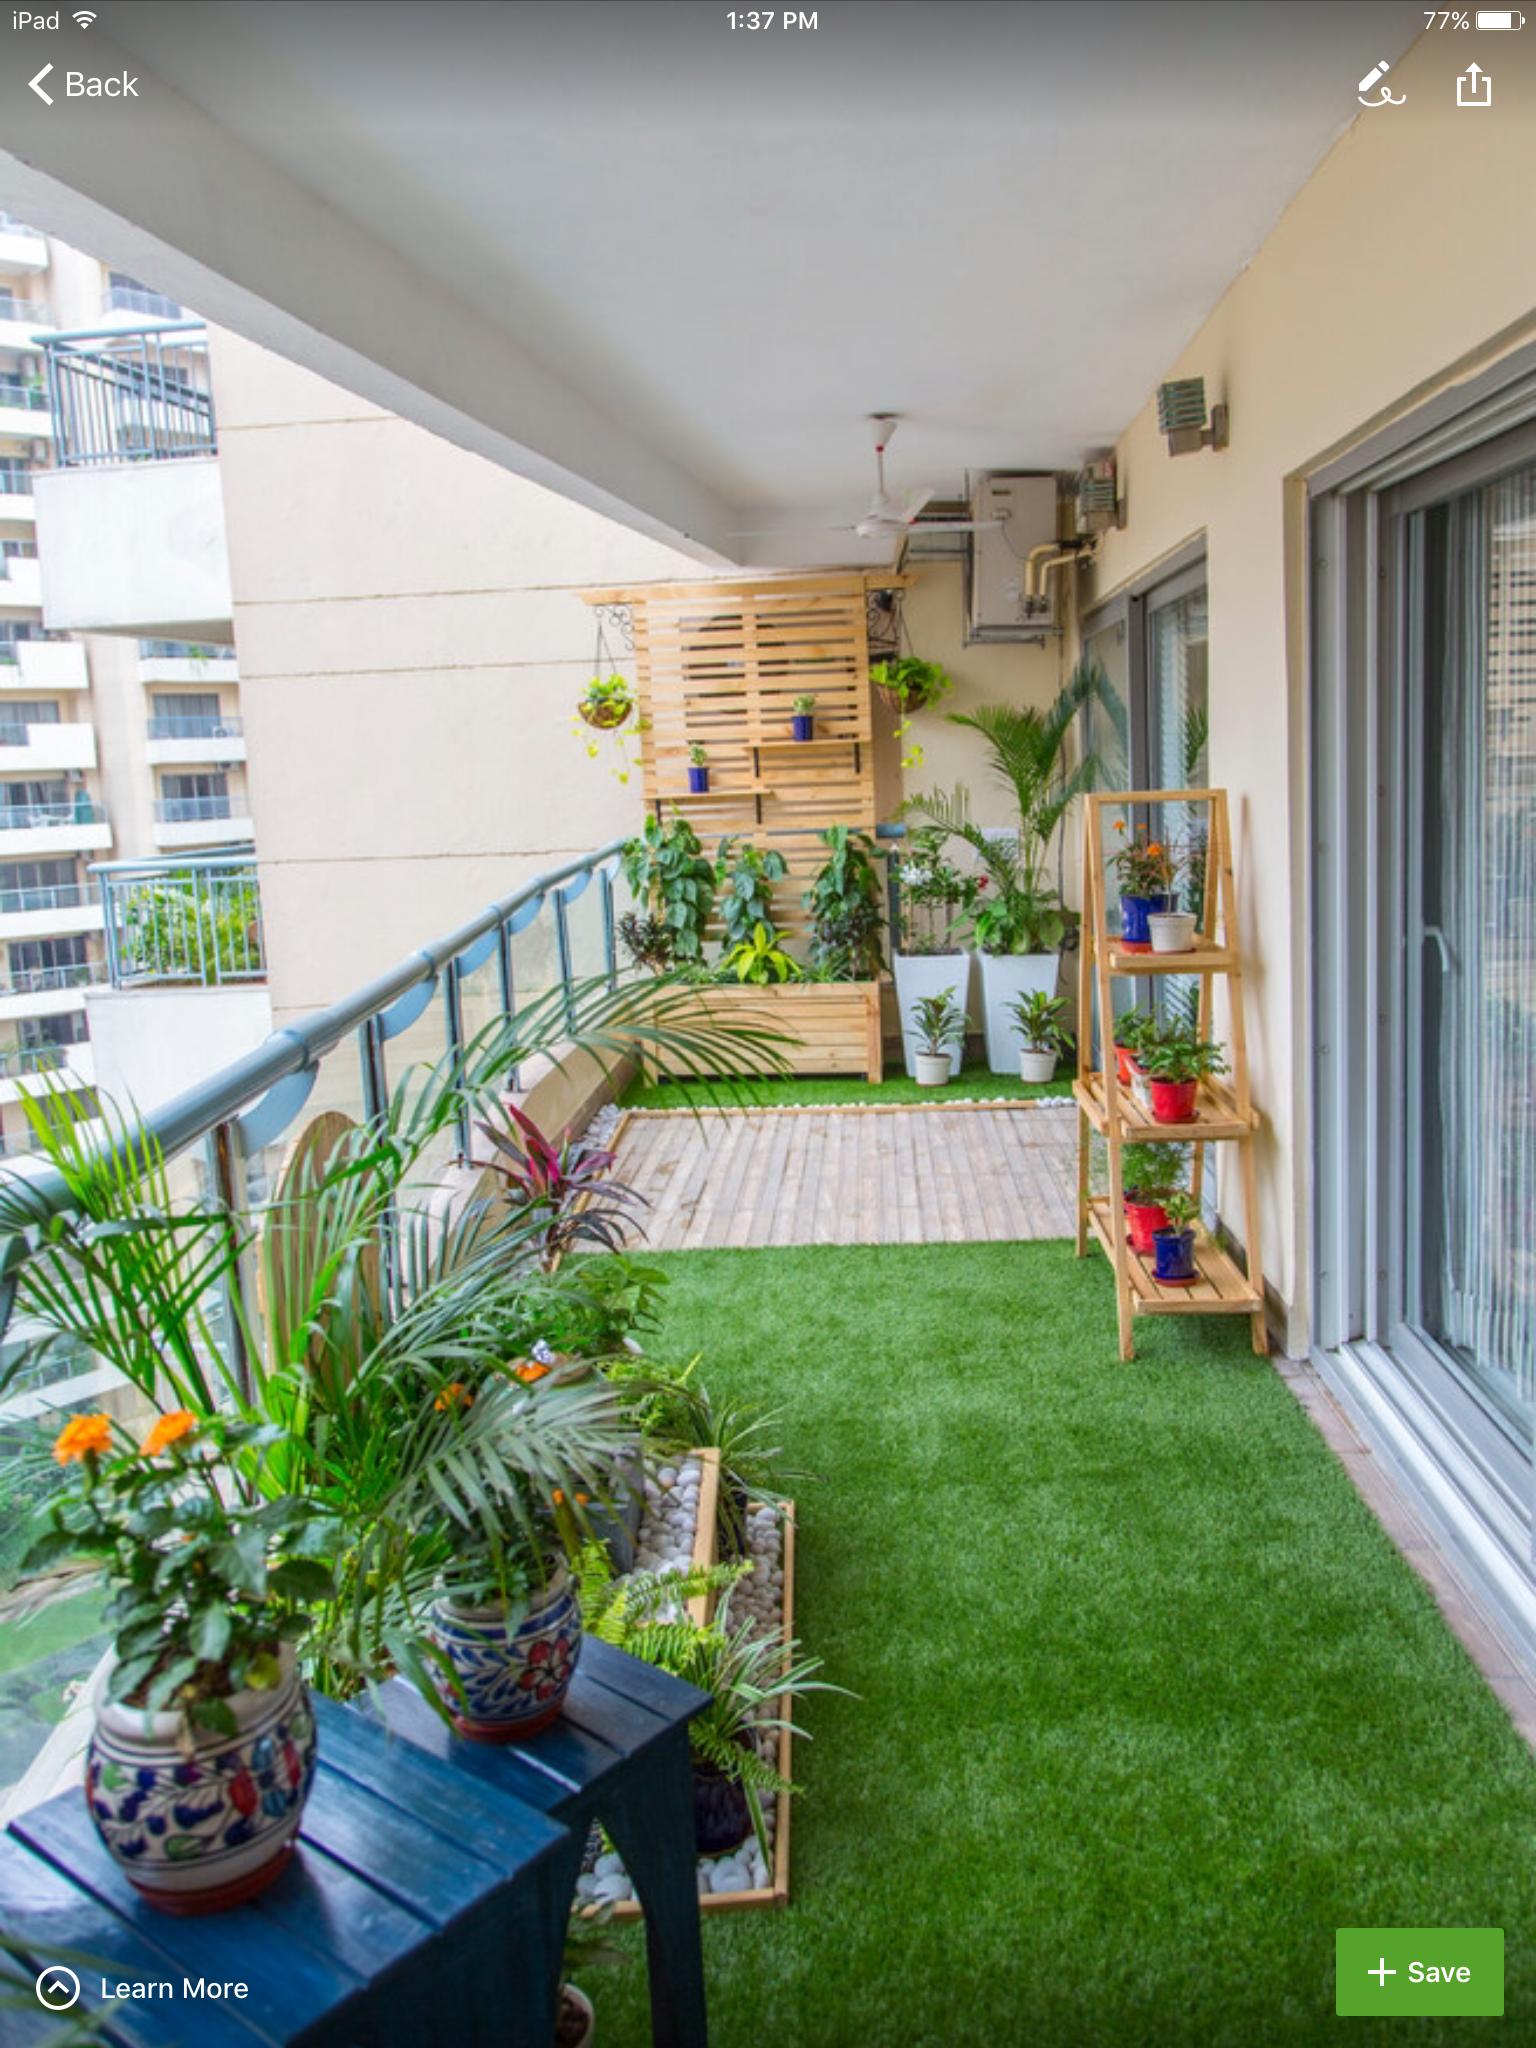 Pin by juhi chandra on Terrace garden ideas in 2019 | Apartment ...